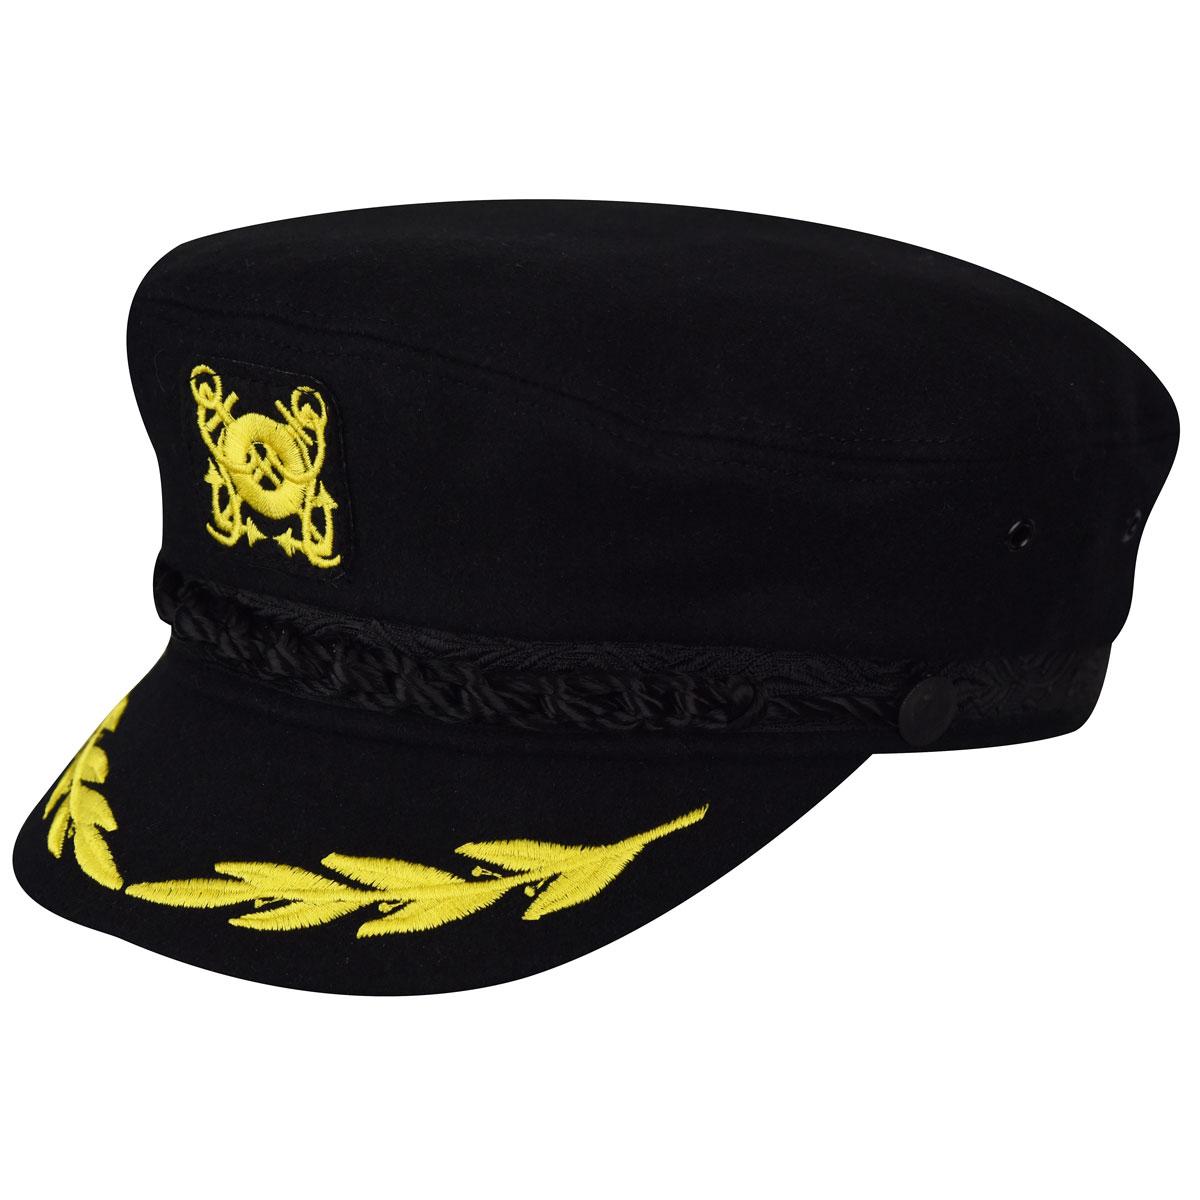 Women's Vintage Hats | Old Fashioned Hats | Retro Hats Wool Captain Cap $38.00 AT vintagedancer.com